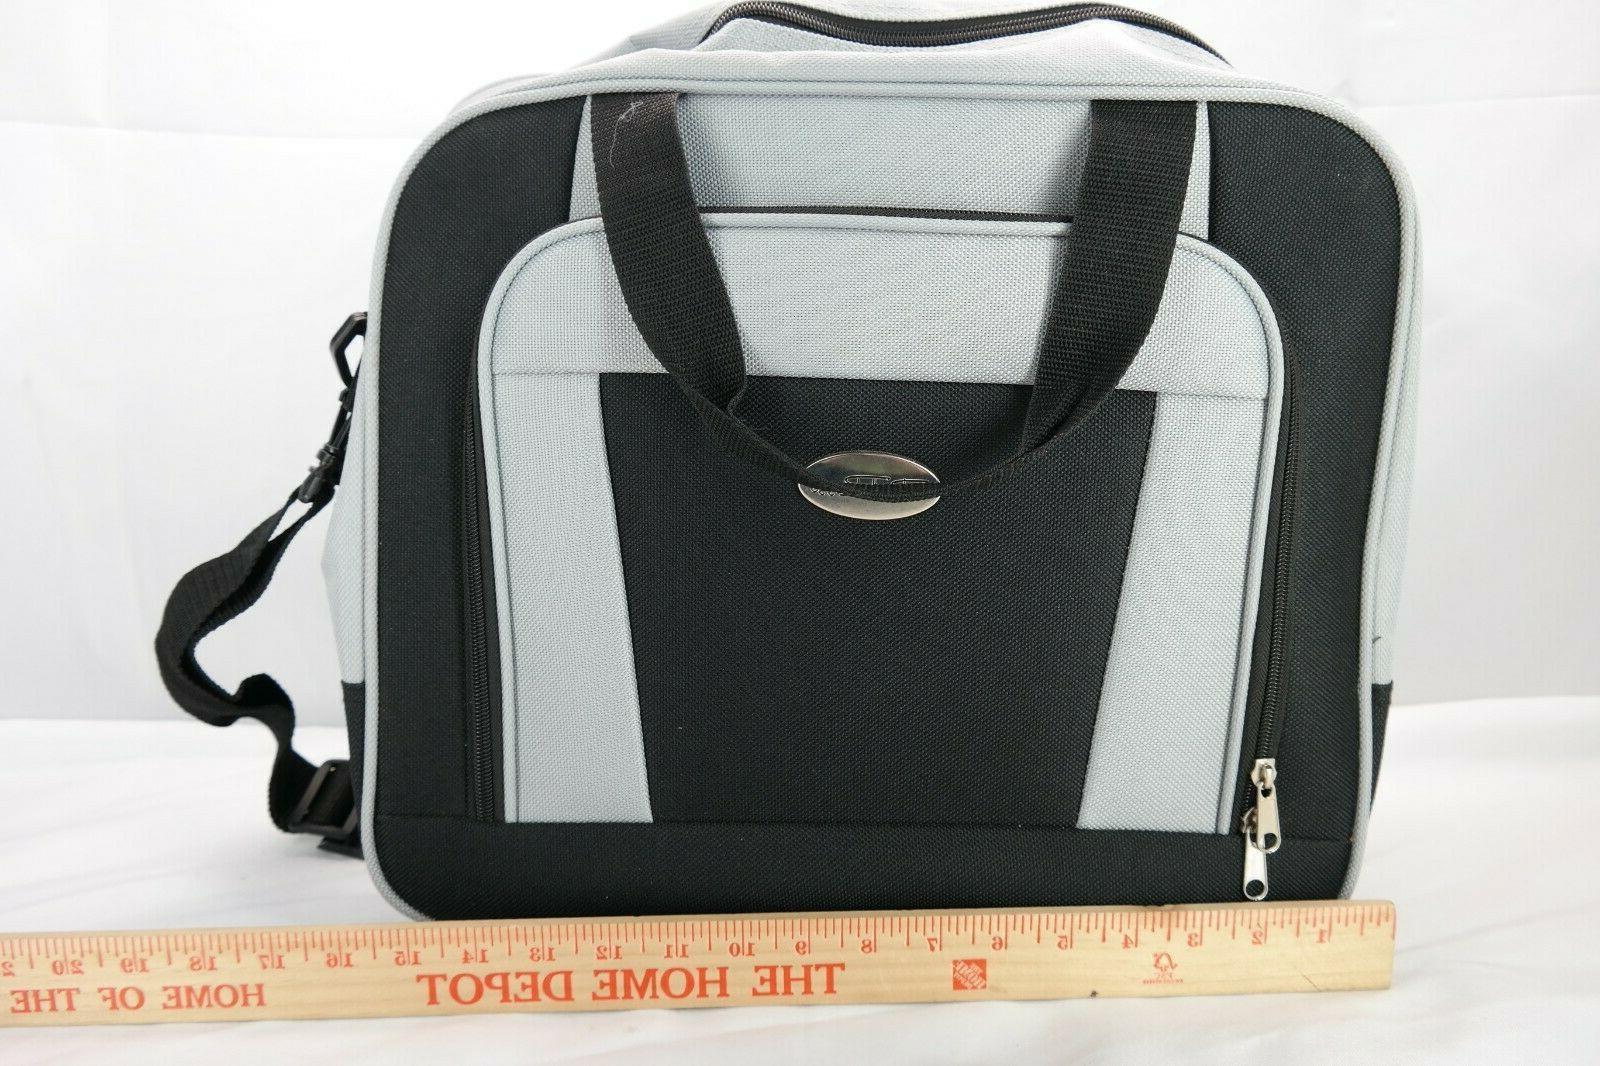 Bella Roller Case a Grey Bag